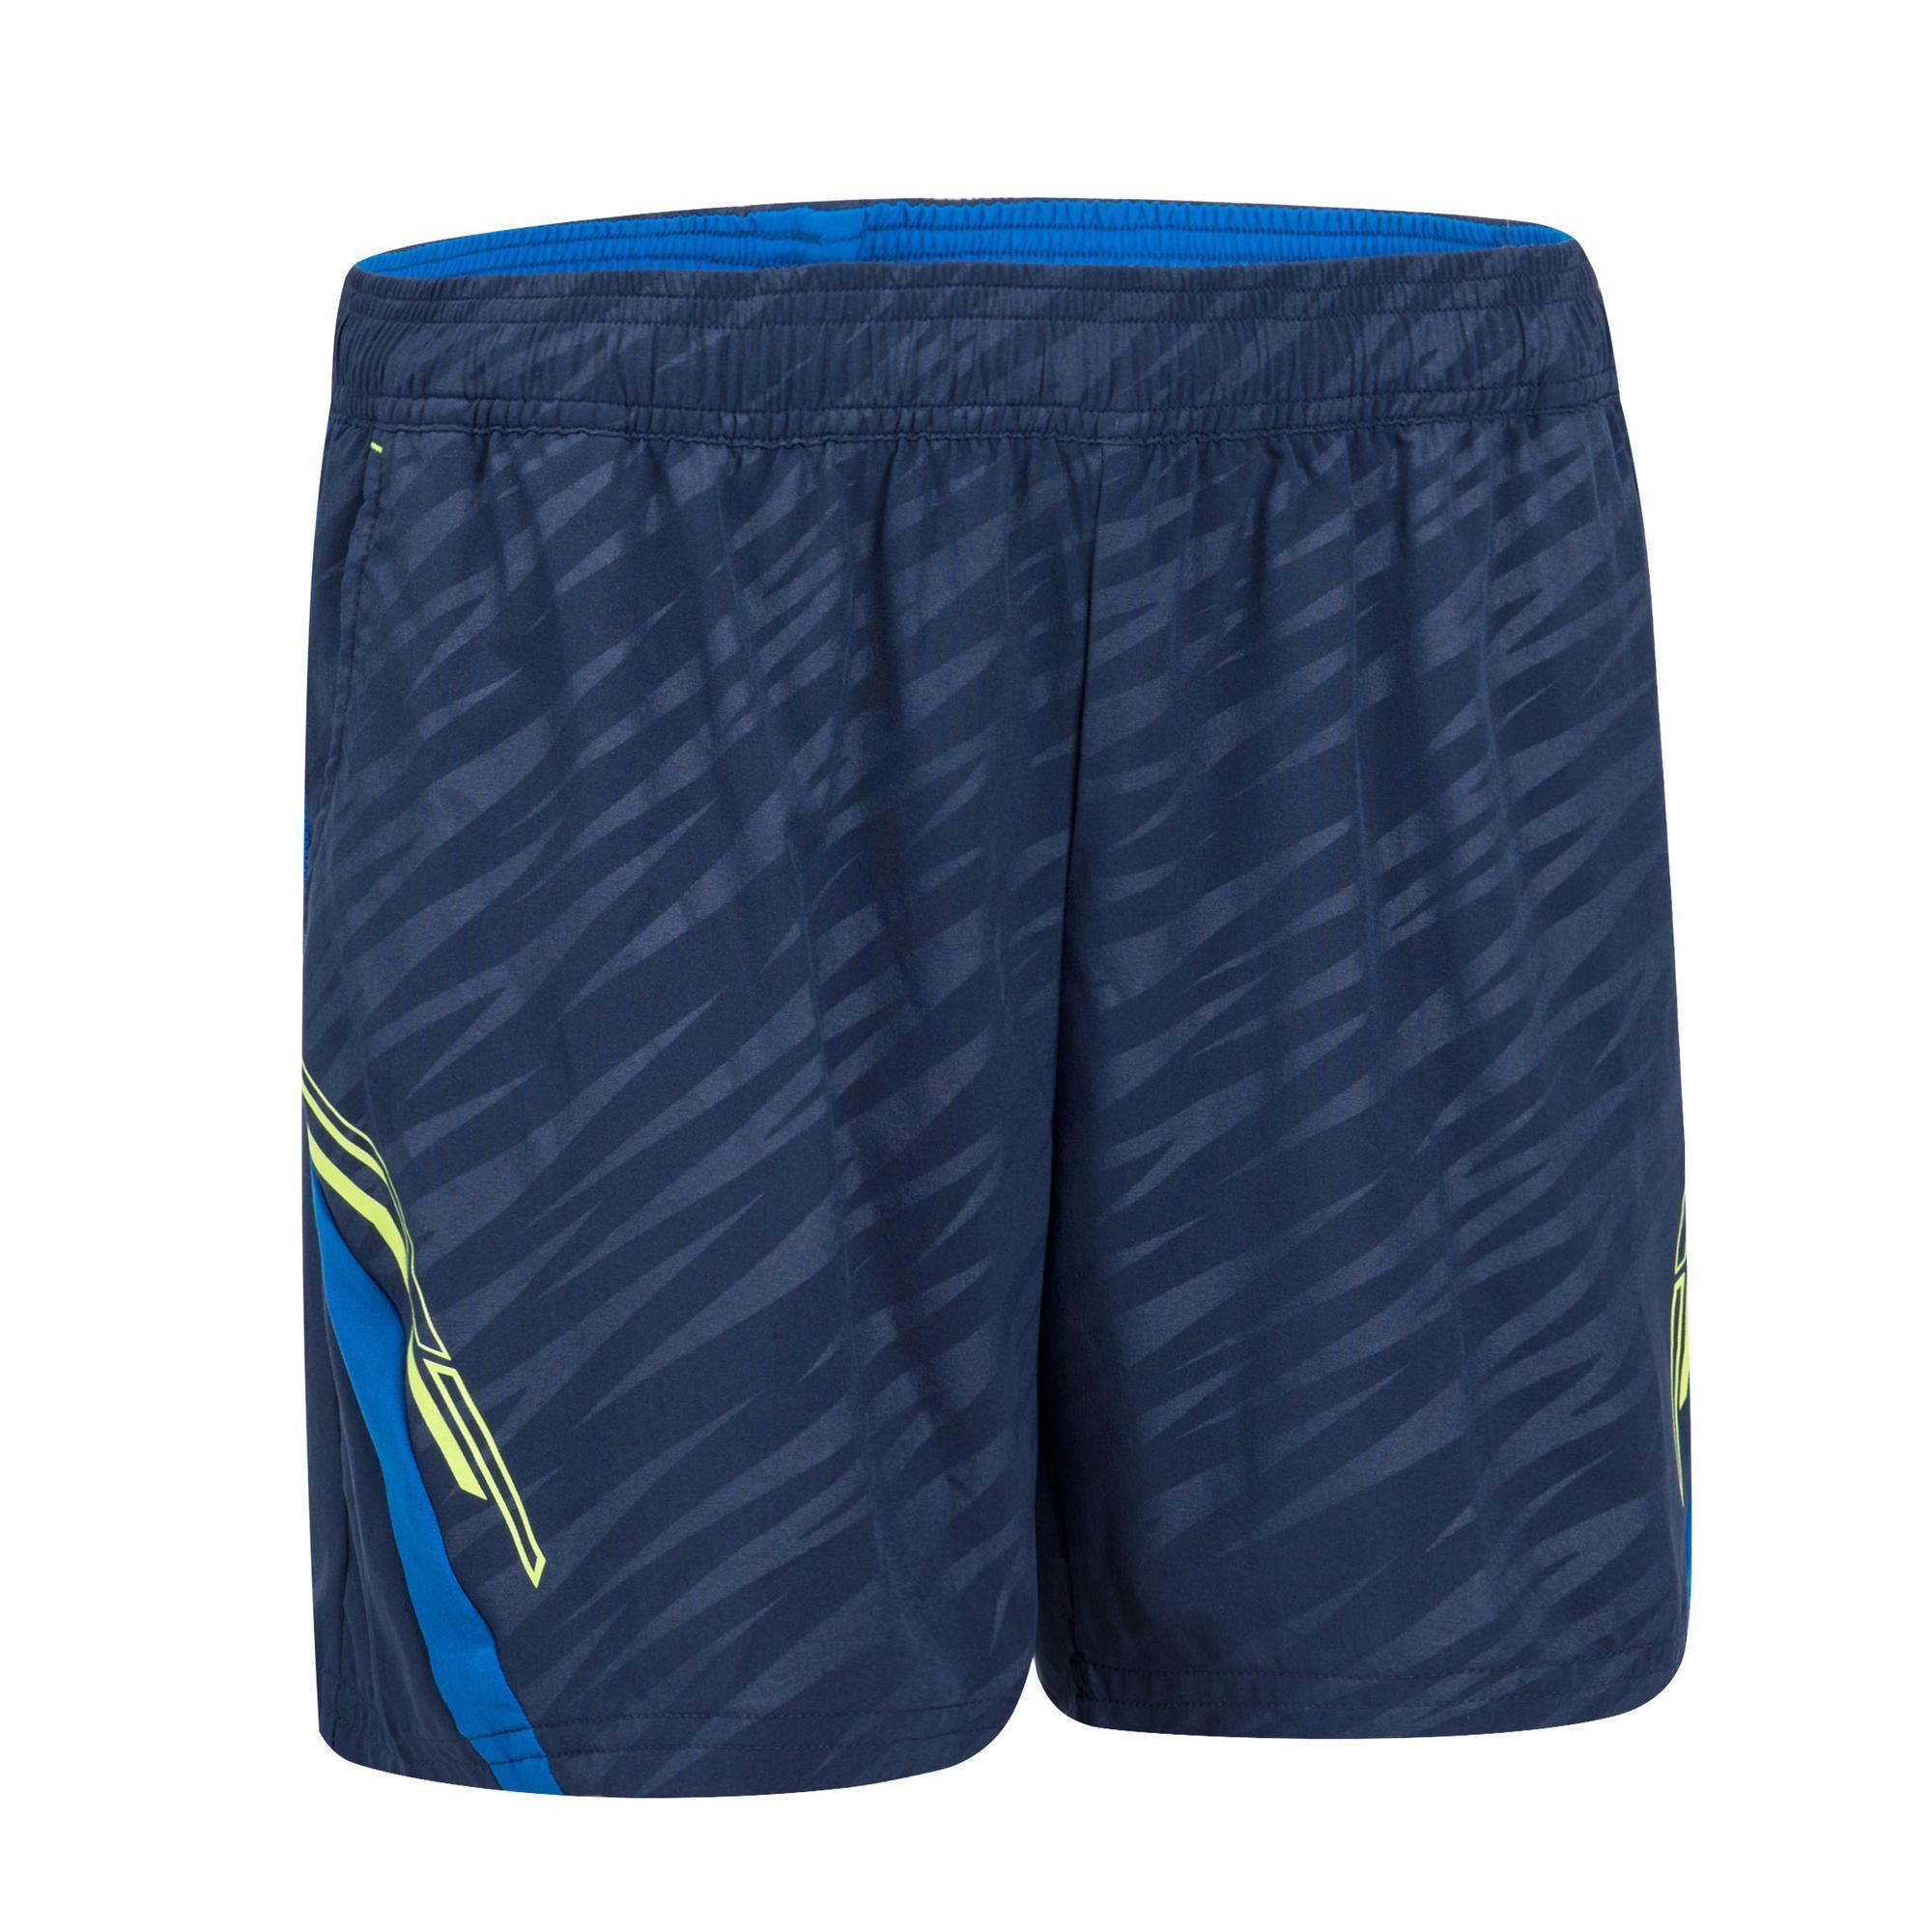 Shorts 860 Tennishose Badminton Damen marineblau/gelb | Sportbekleidung > Sporthosen > Tennisshorts | Blau - Gelb | Perfly